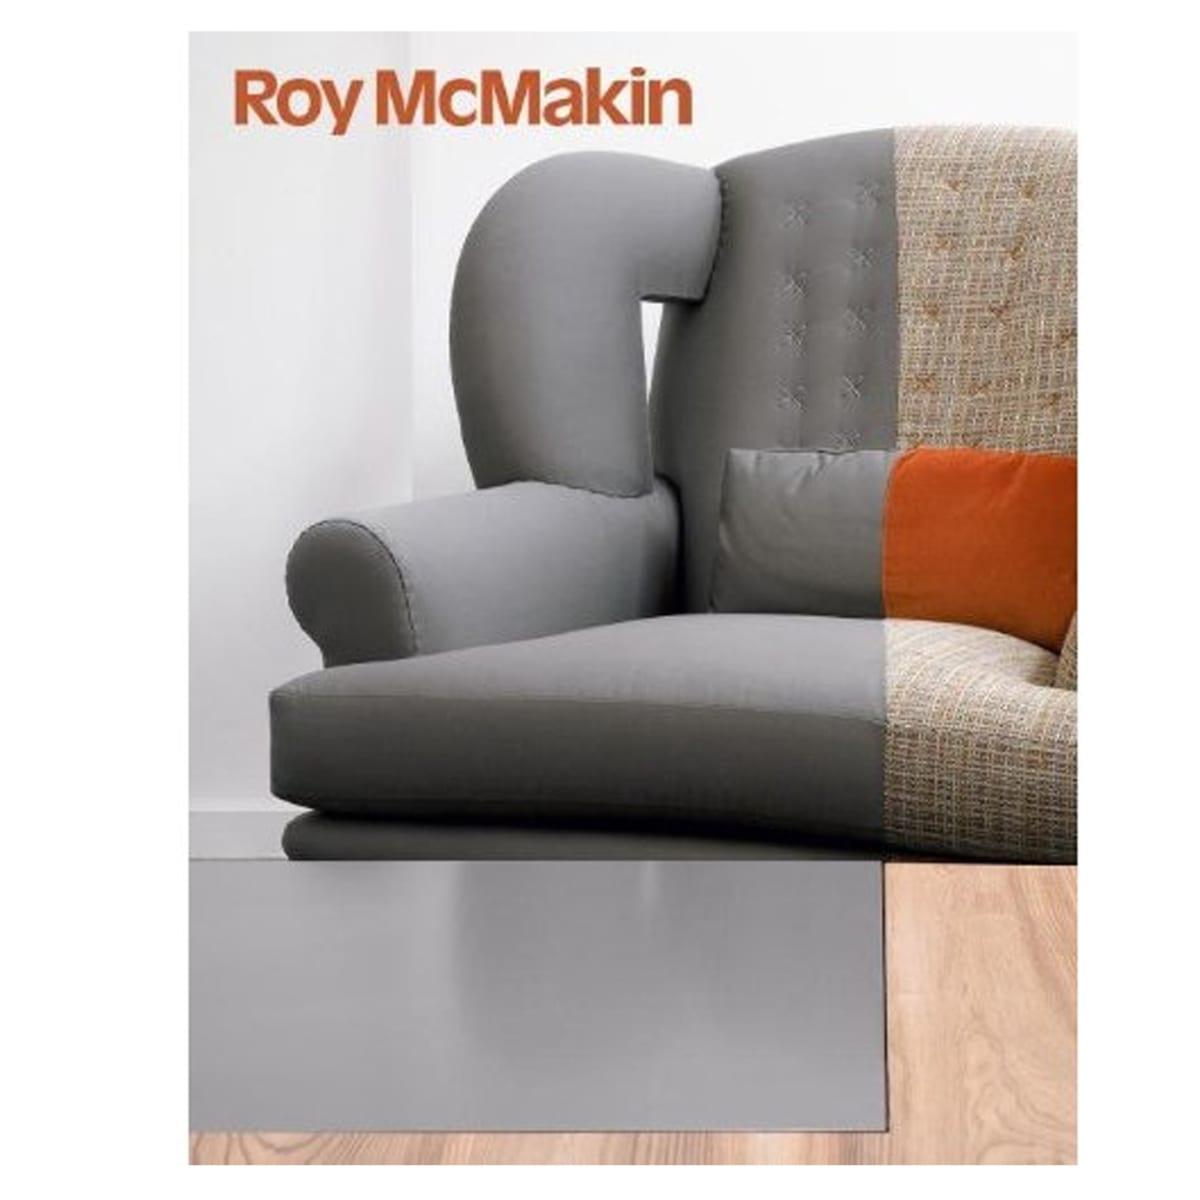 Roy McMakin